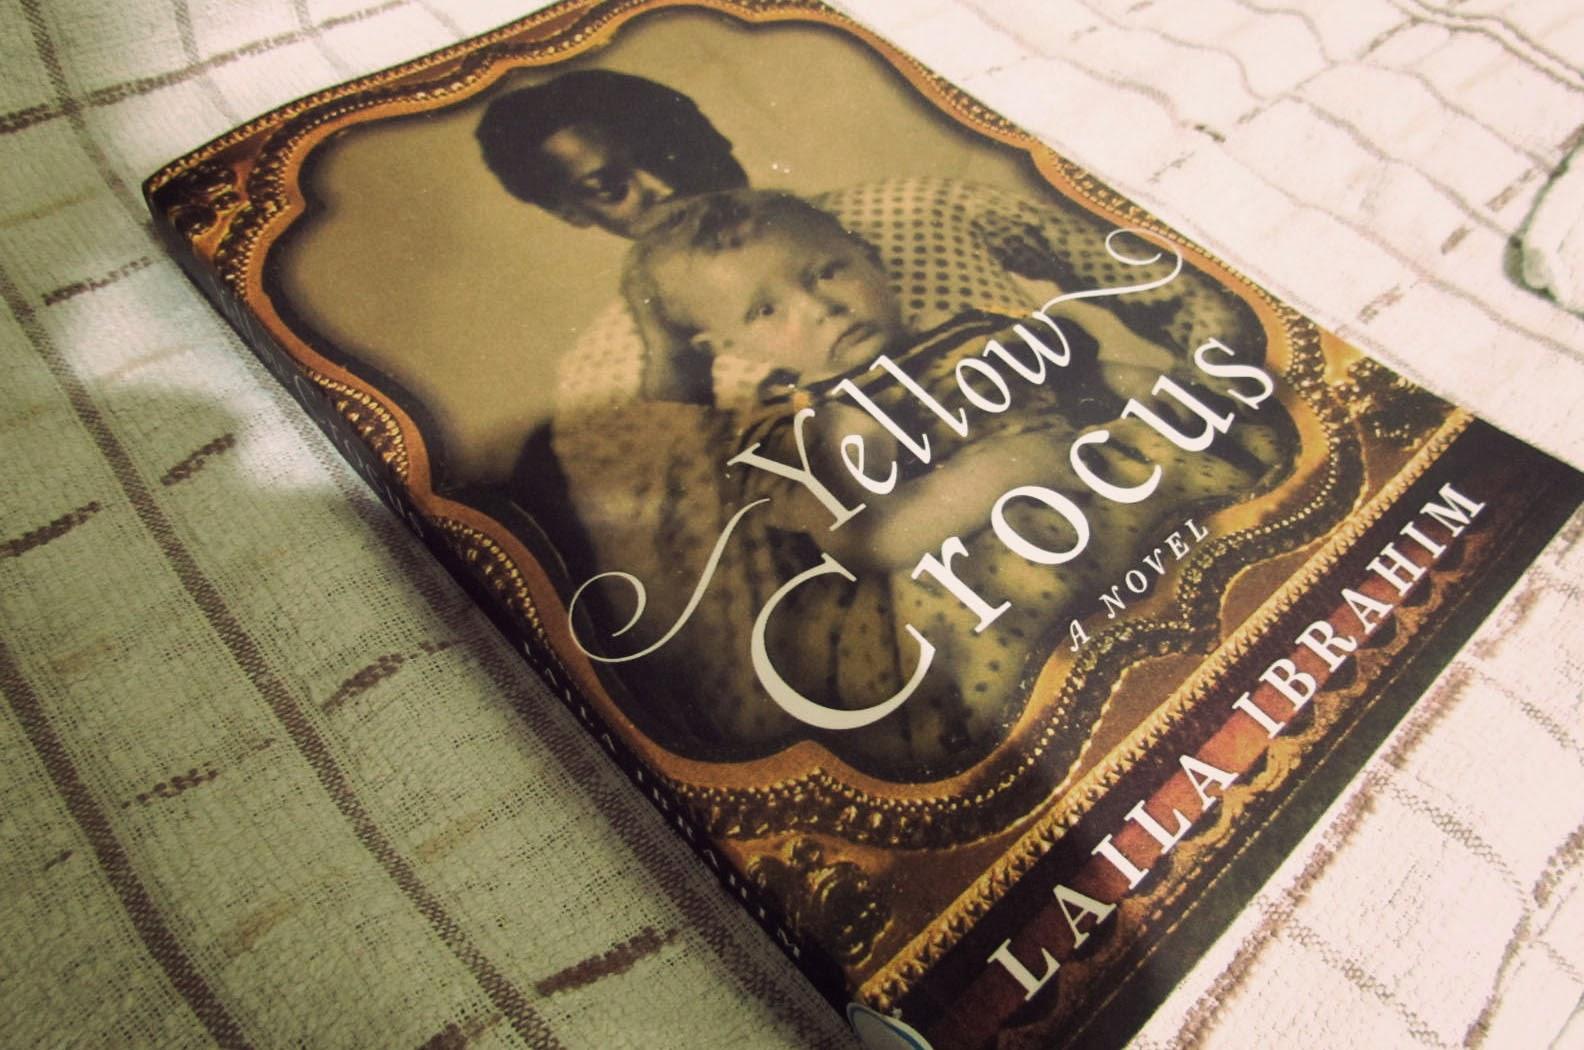 Laila Ibrahim, Yellow Crocus, historical fiction, slavery, mammy, black wet nurse, literature, review, book review